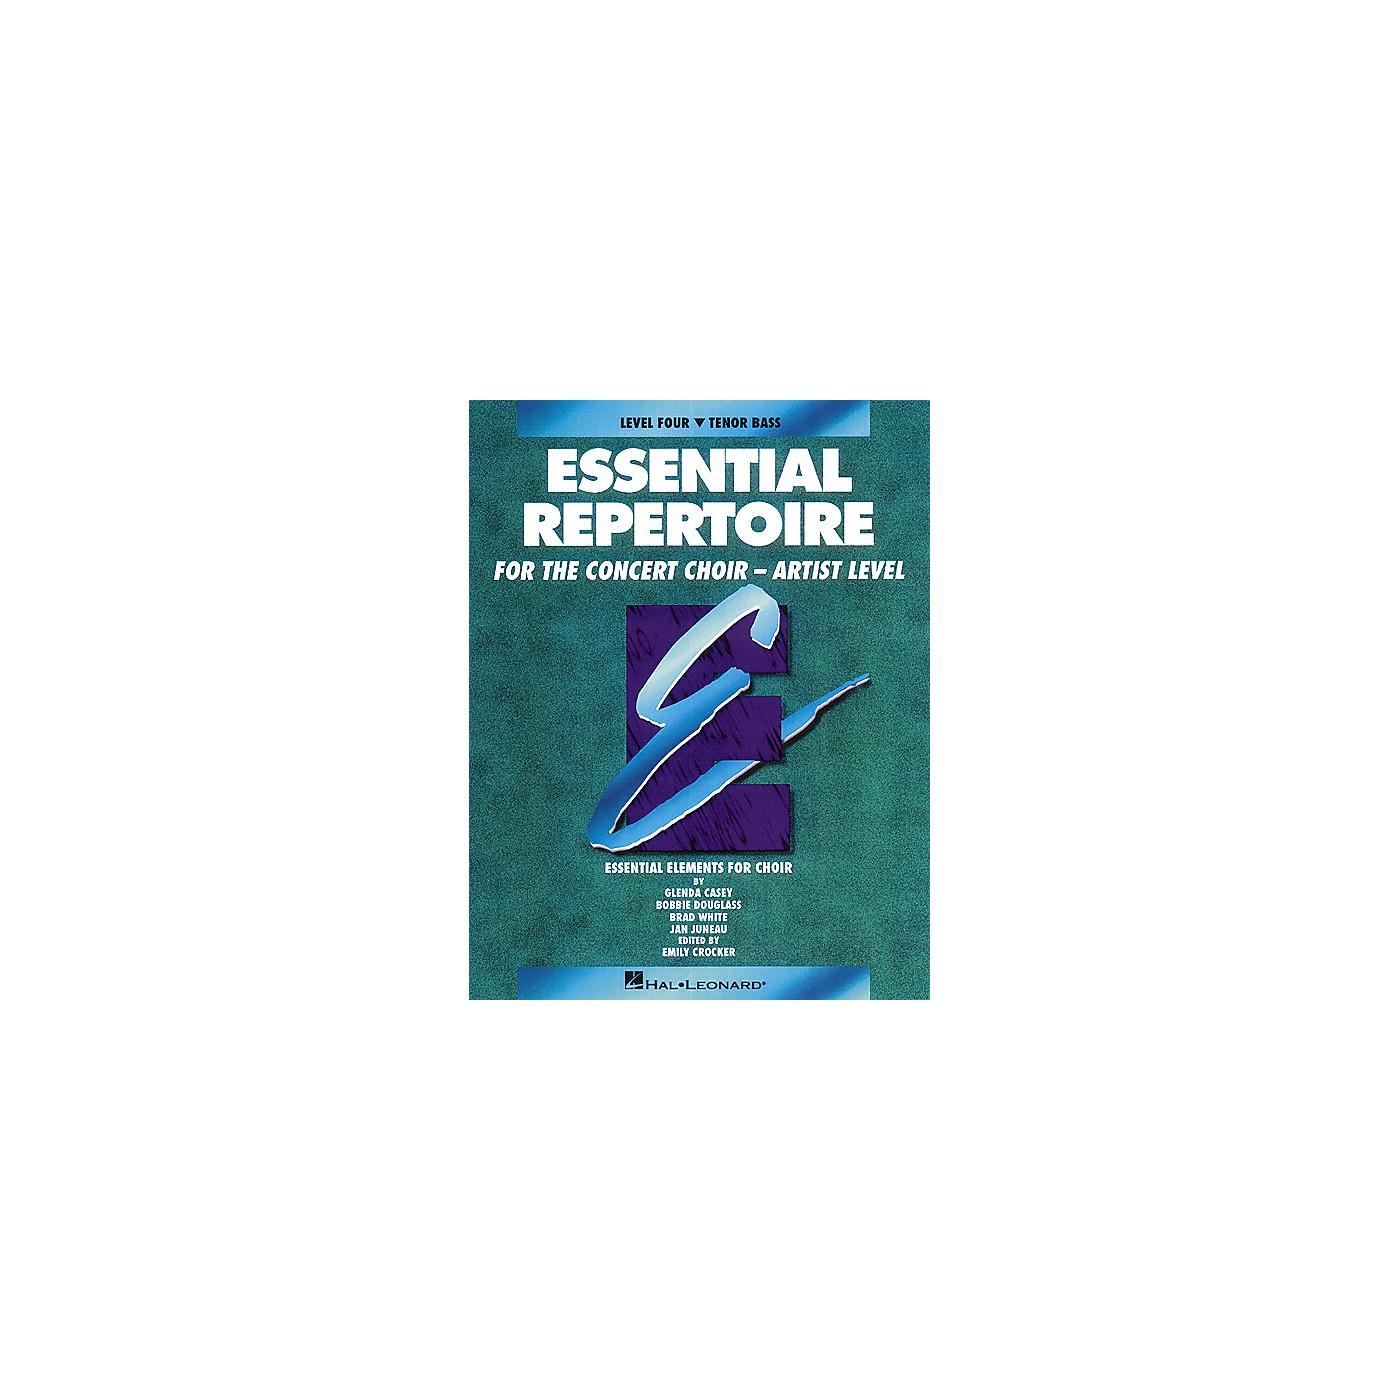 Hal Leonard Essential Repertoire for the Concert Choir - Artist Level Tenor Bass Perf/Acc CDs (2) by Glenda Casey thumbnail